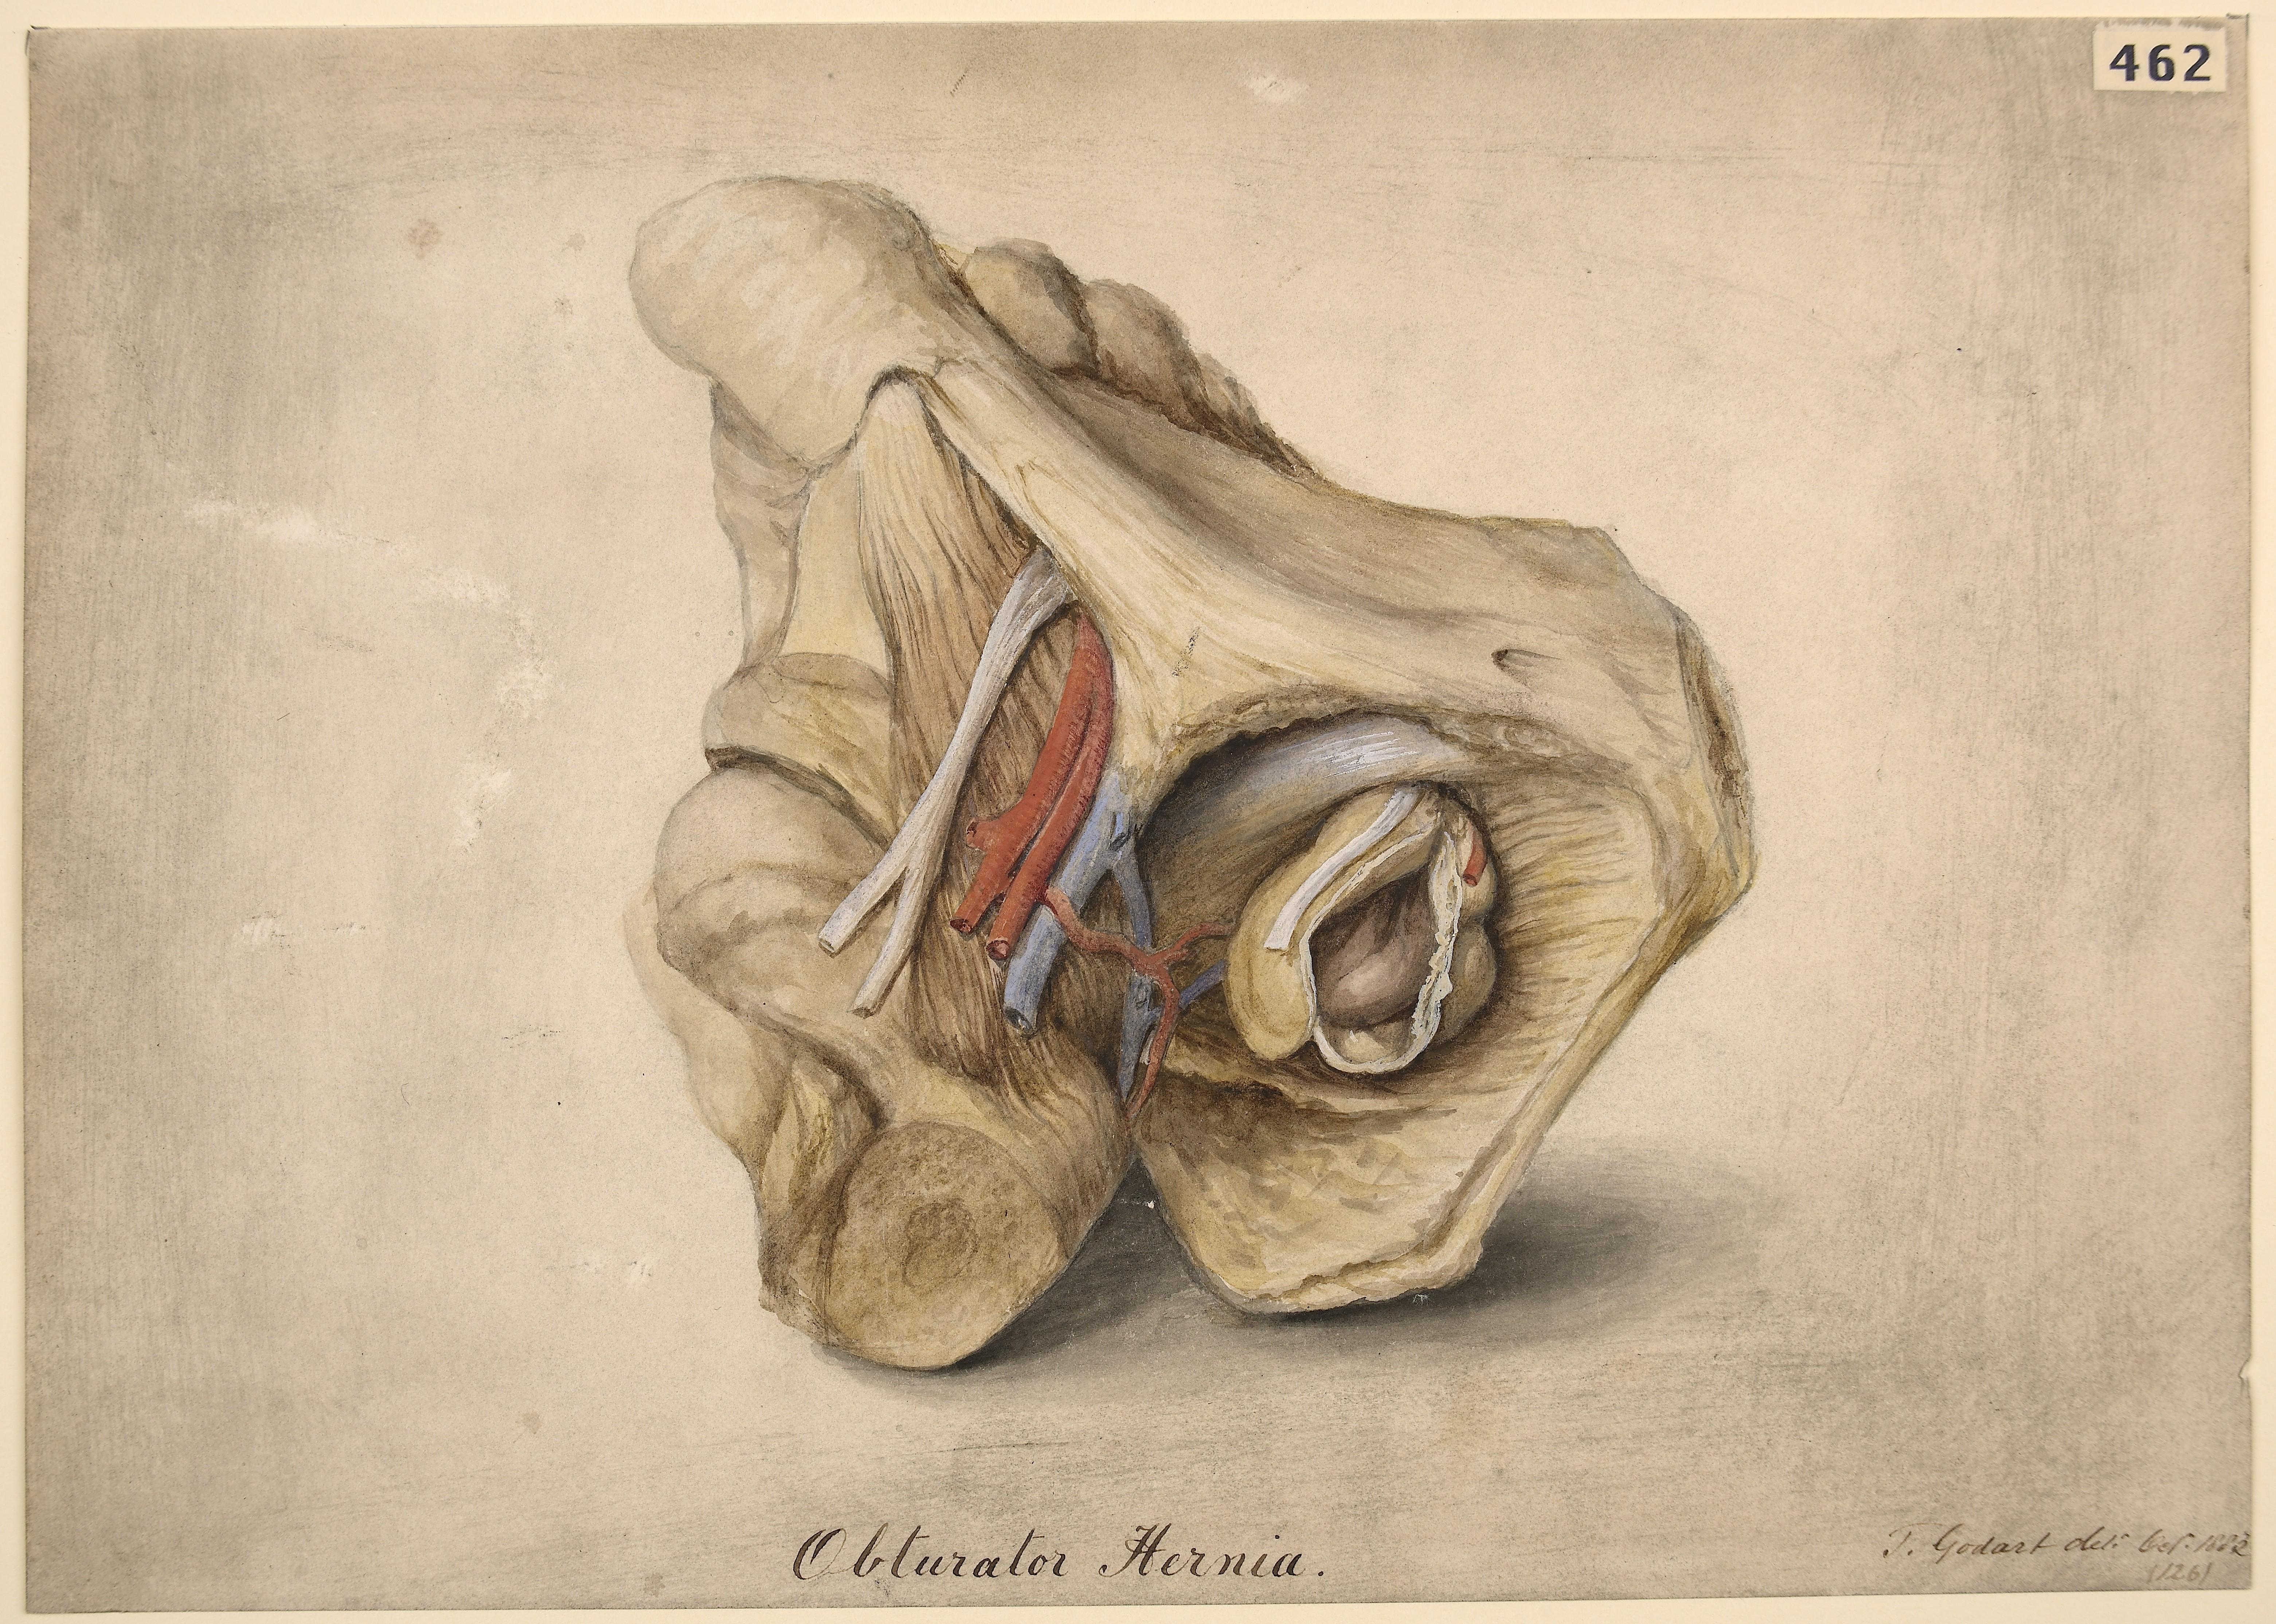 File:Obturator hernia Wellcome L0061626.jpg - Wikimedia Commons